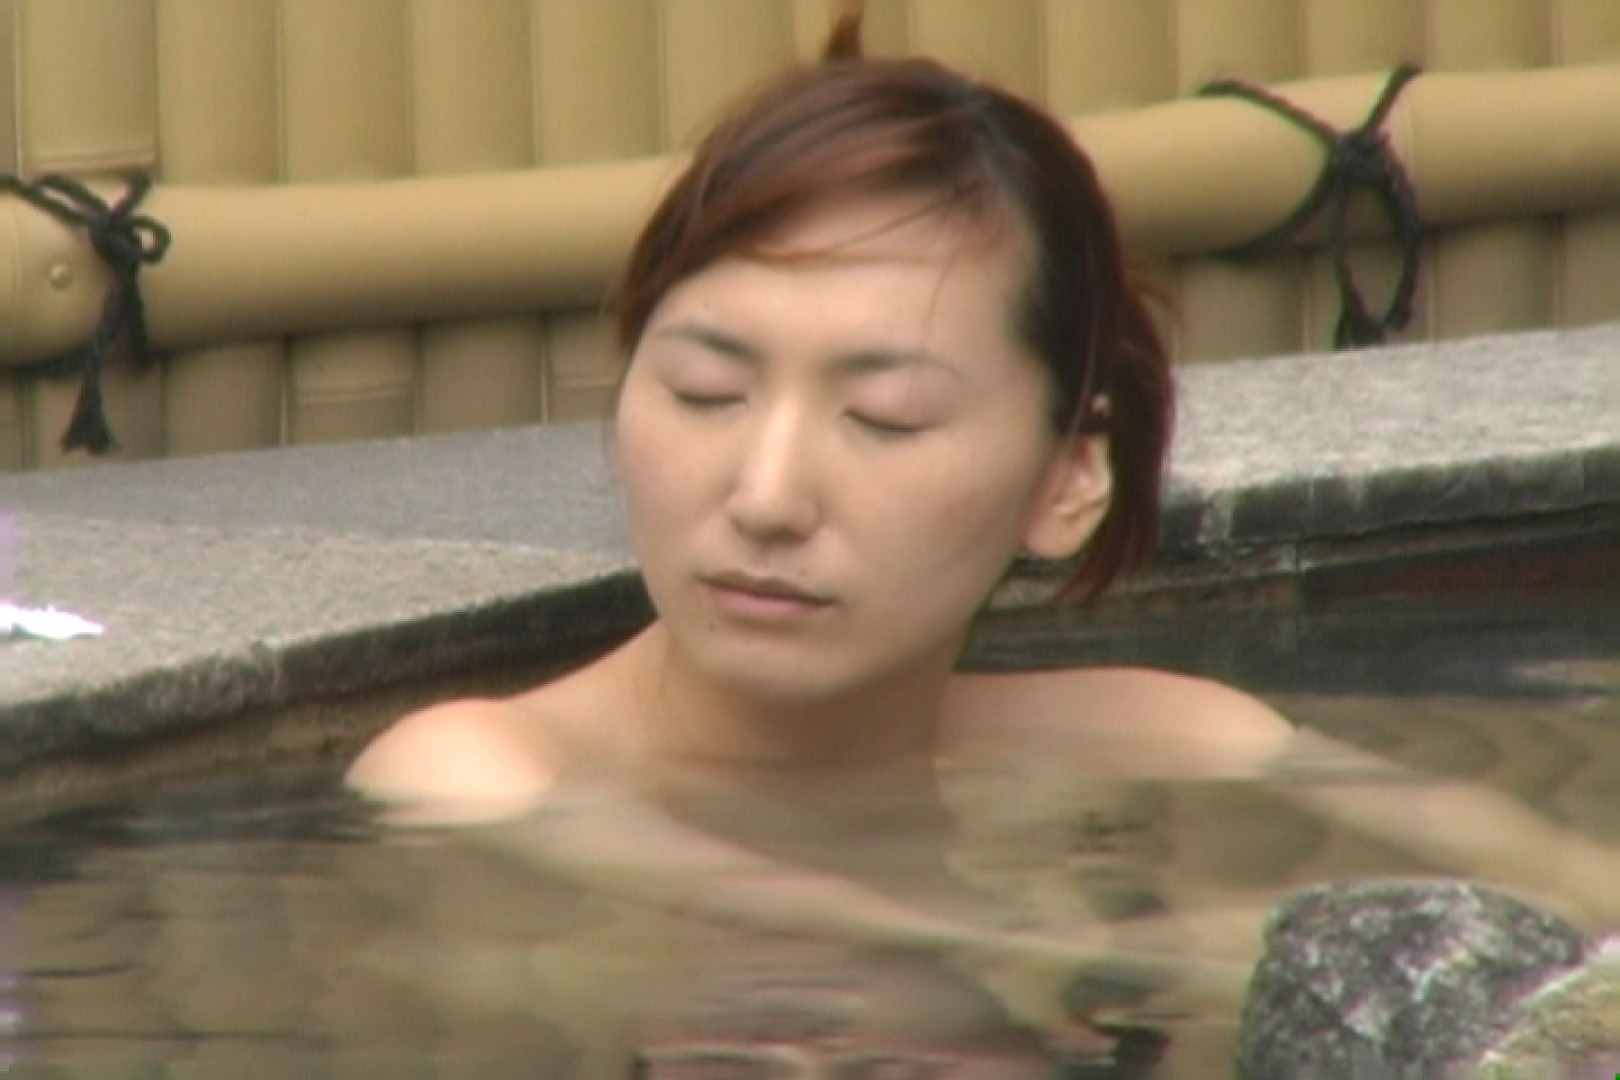 Aquaな露天風呂Vol.616 露天風呂編   盗撮シリーズ  89PIX 51